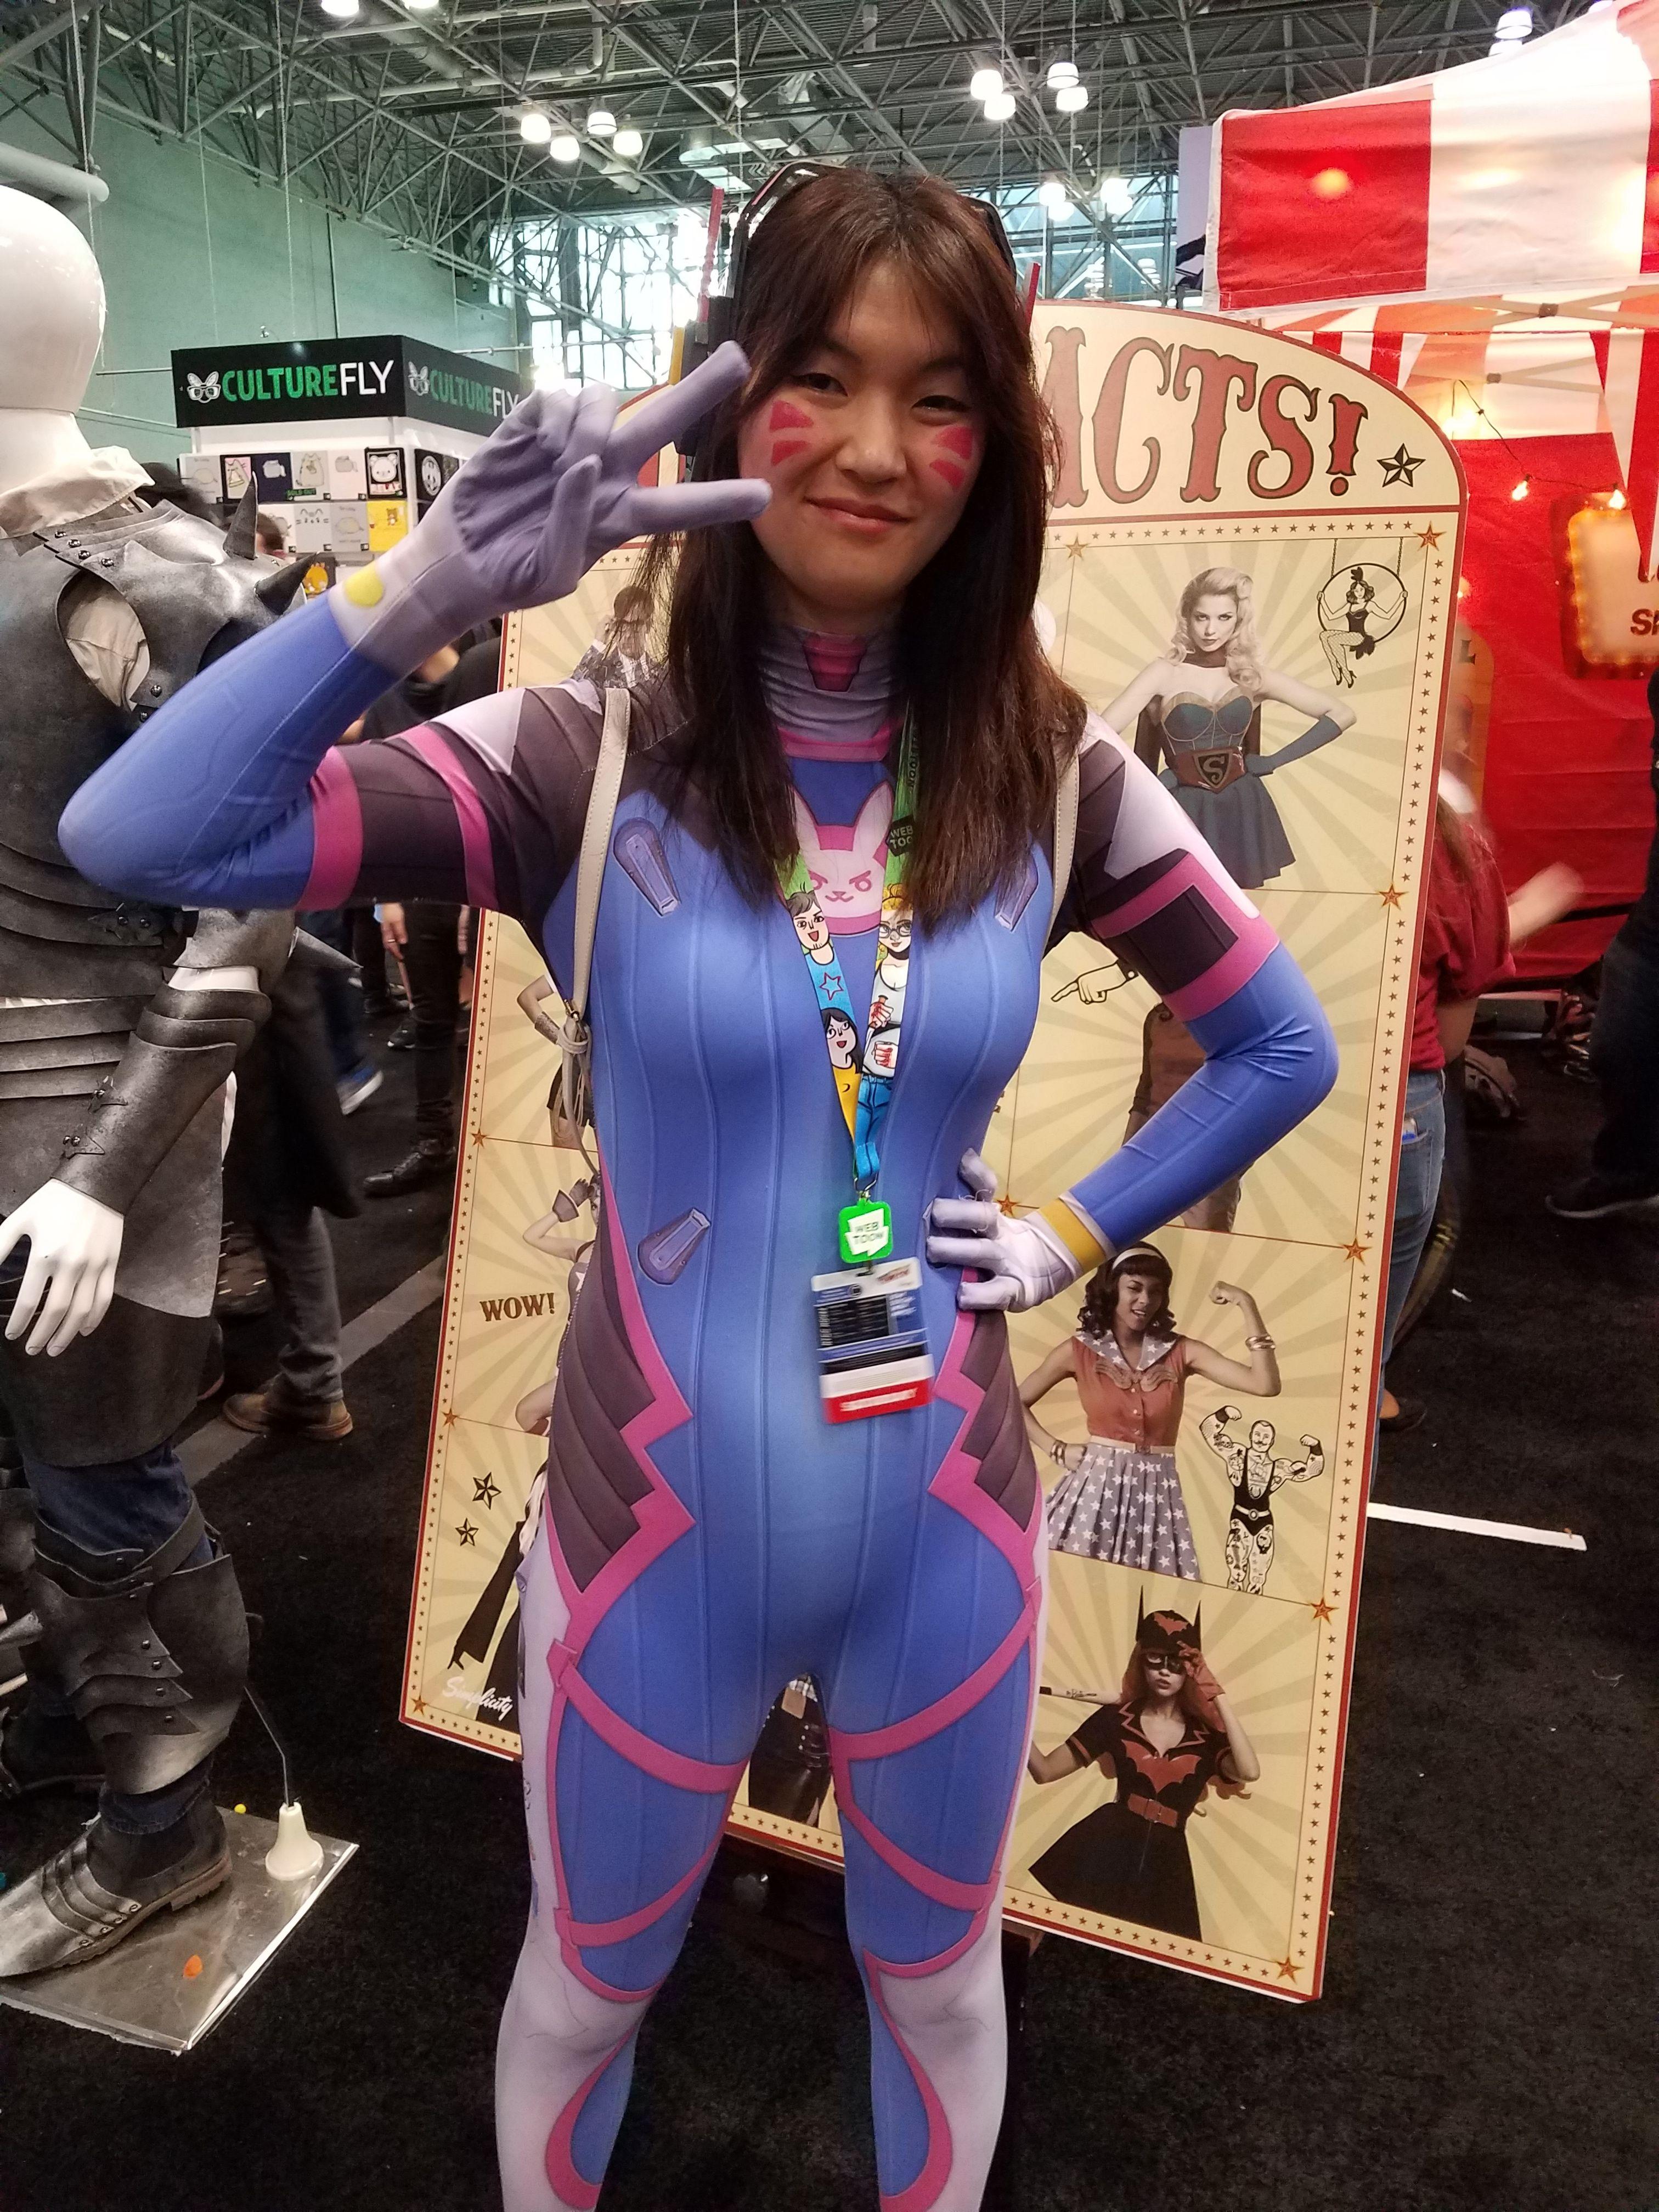 NYCC 2017 Cosplay Images: Superman, Batman, Wonder Woman ...